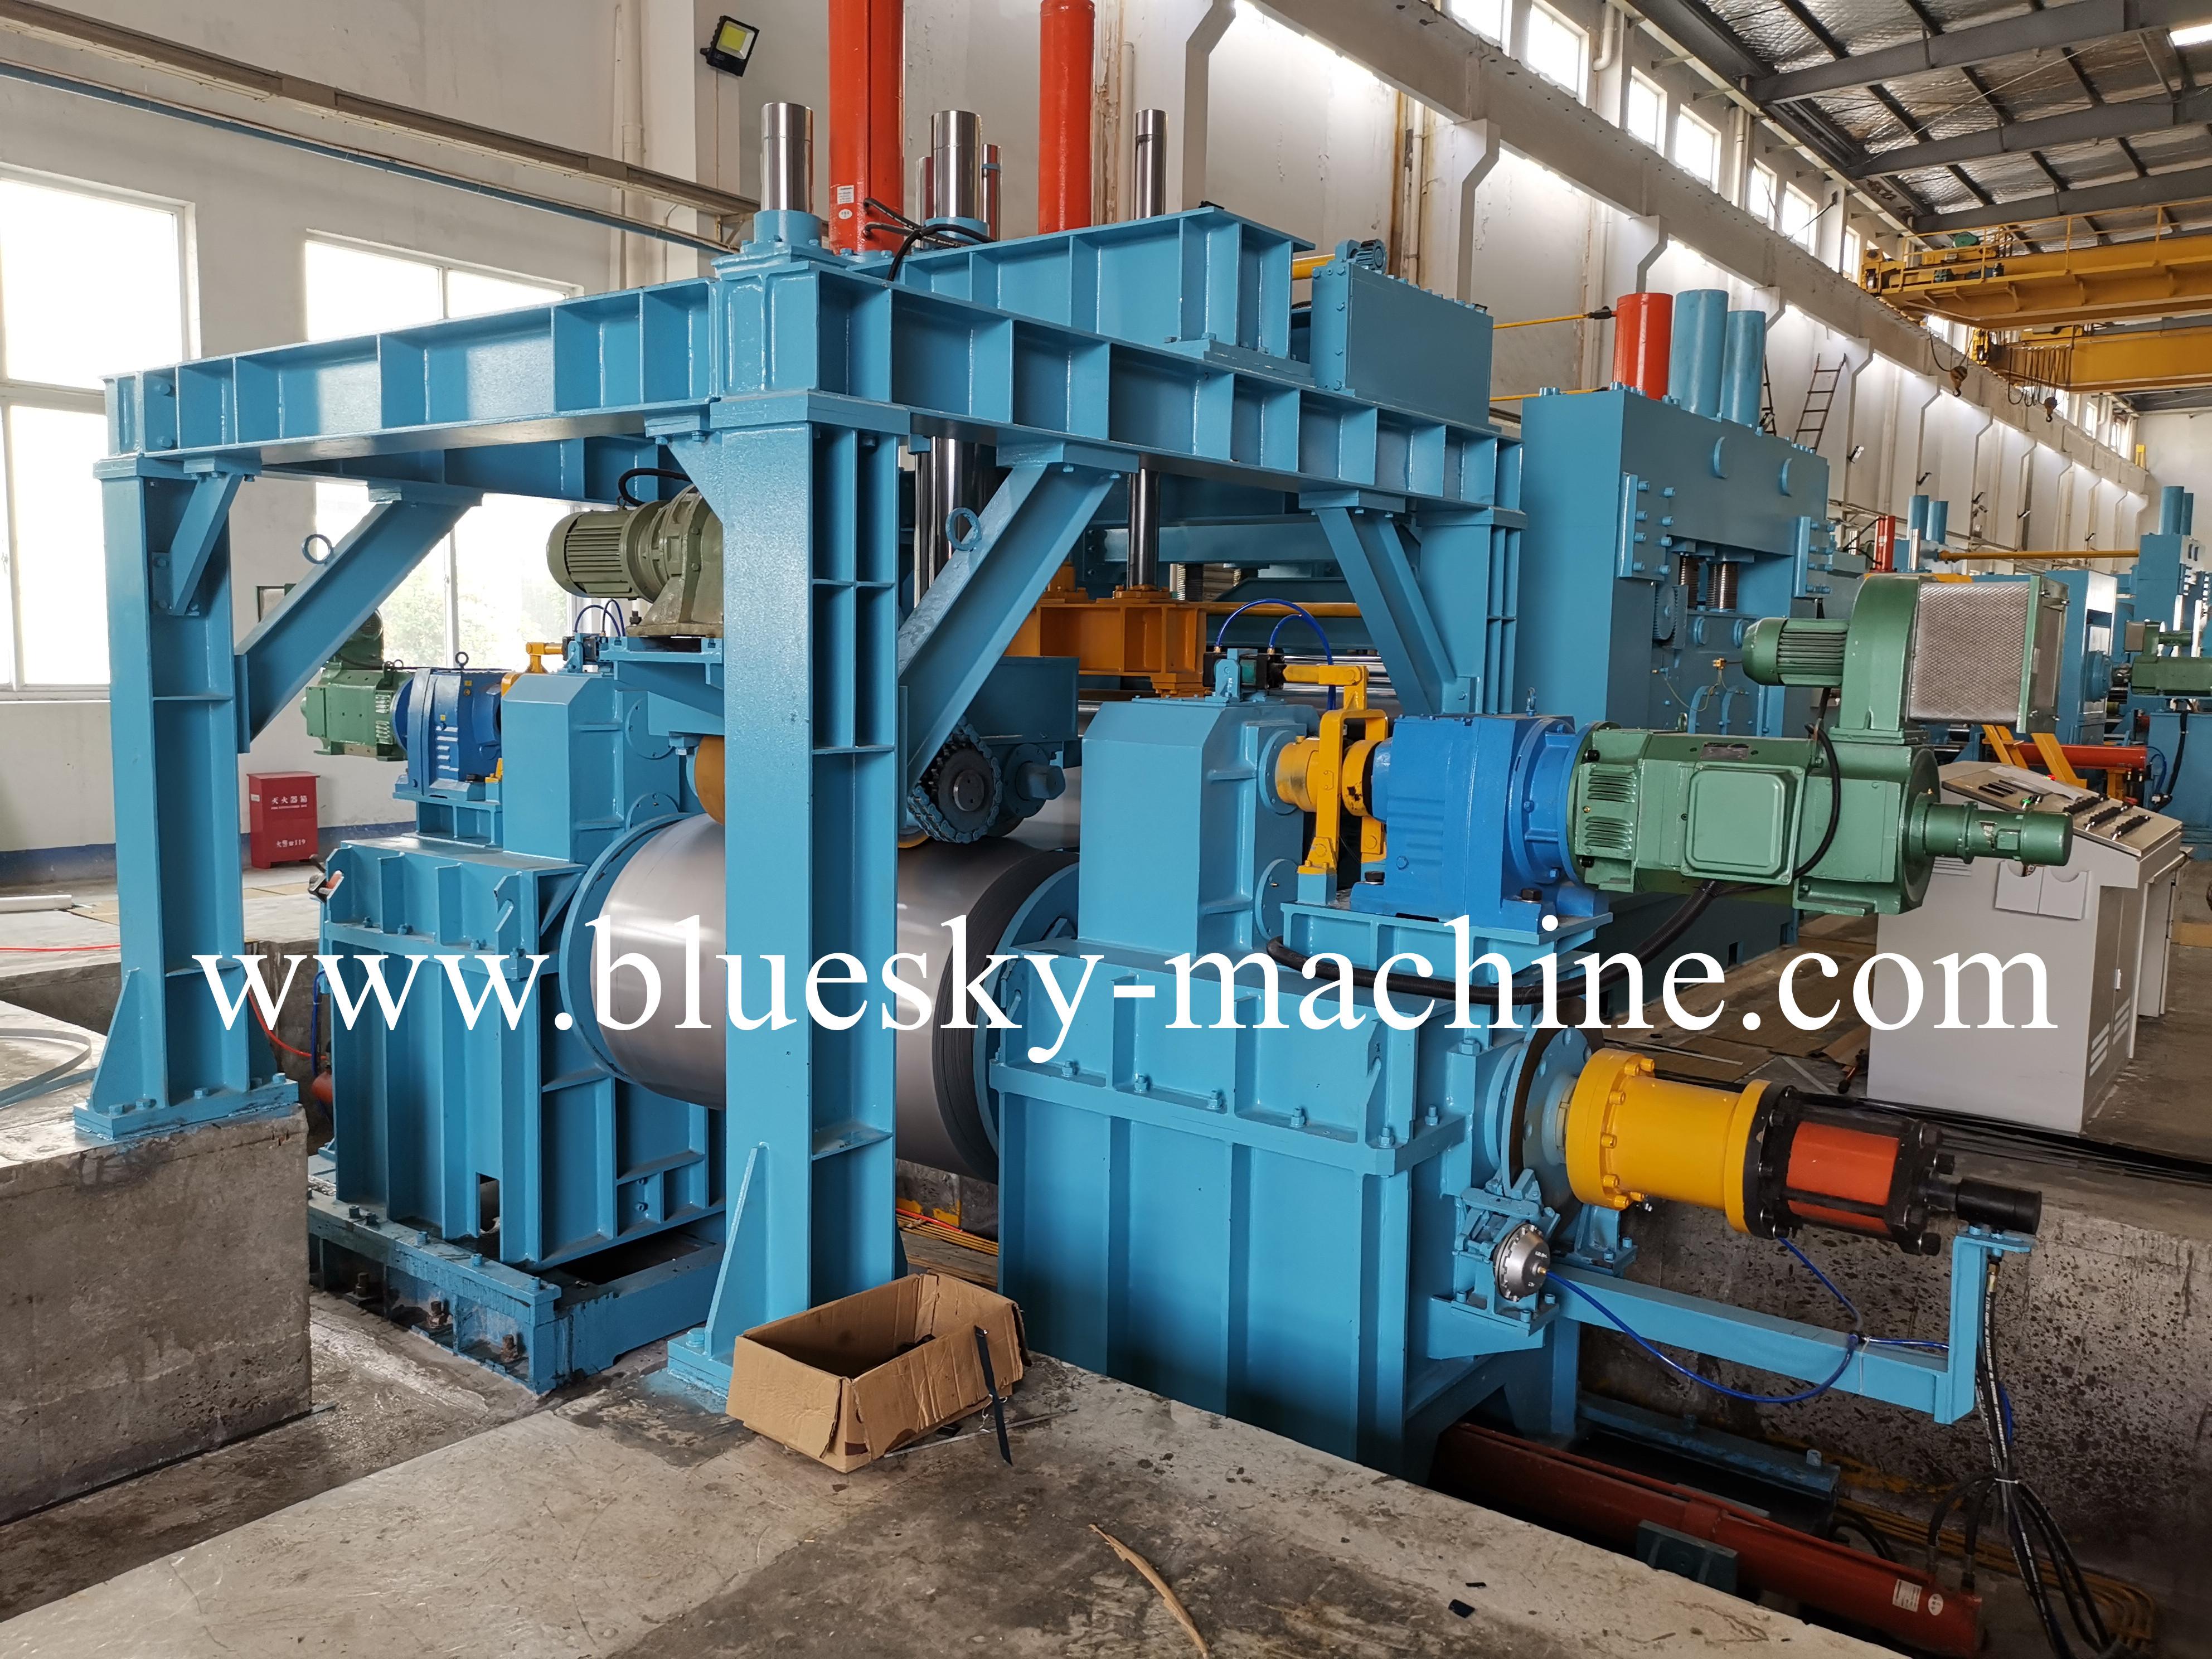 4.Hydraulic Uncoiler